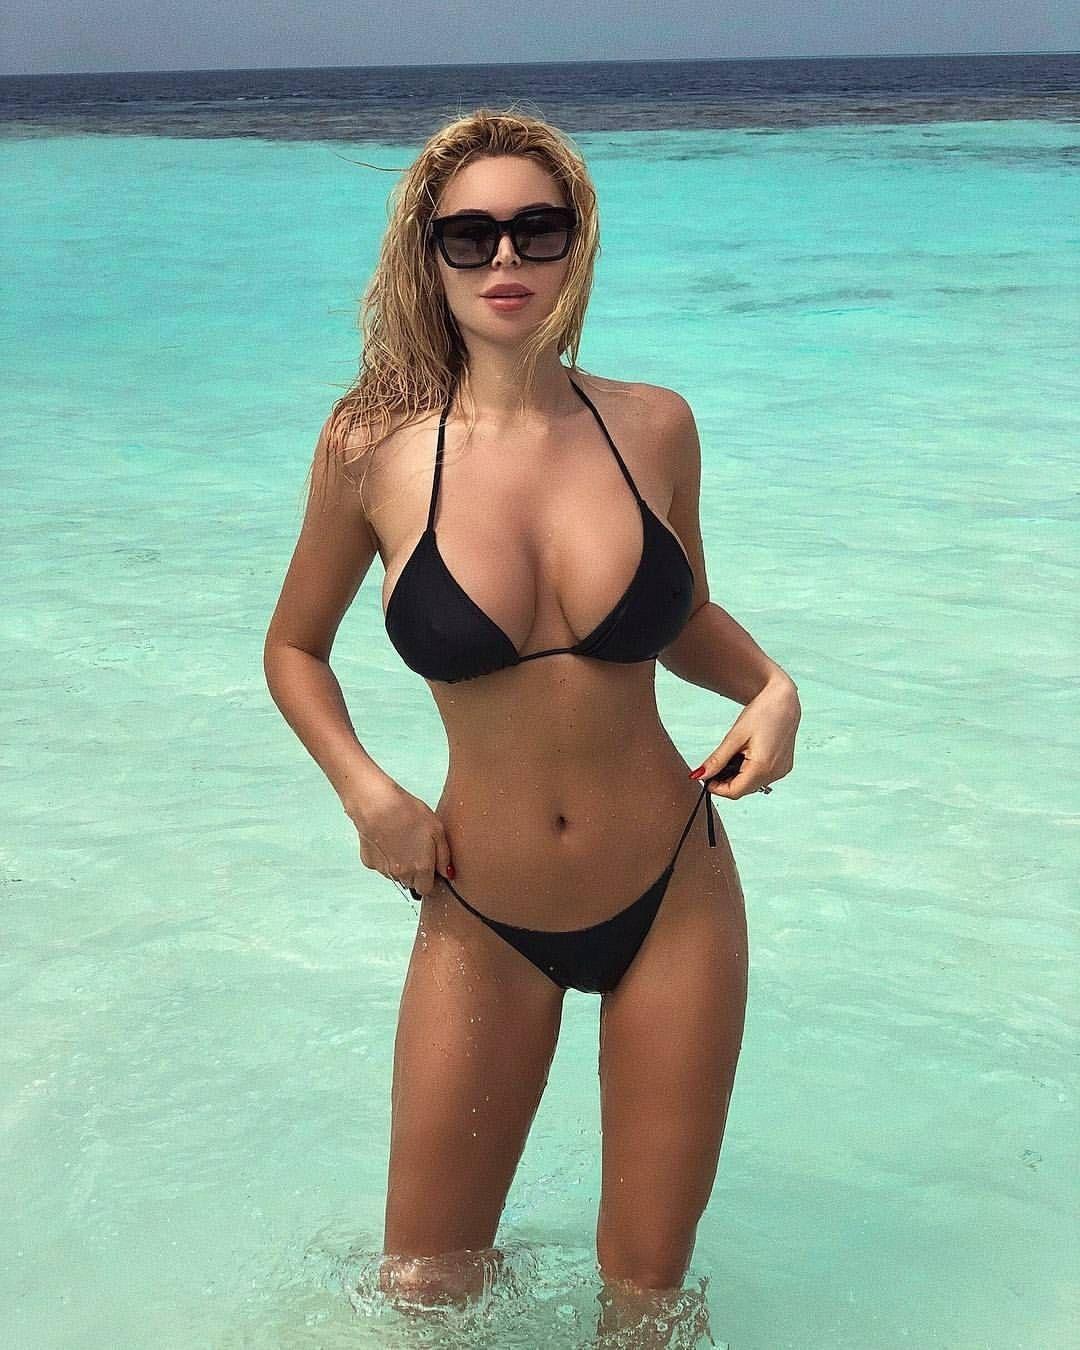 Bikini Anastasija Budic nudes (69 pics), Instagram